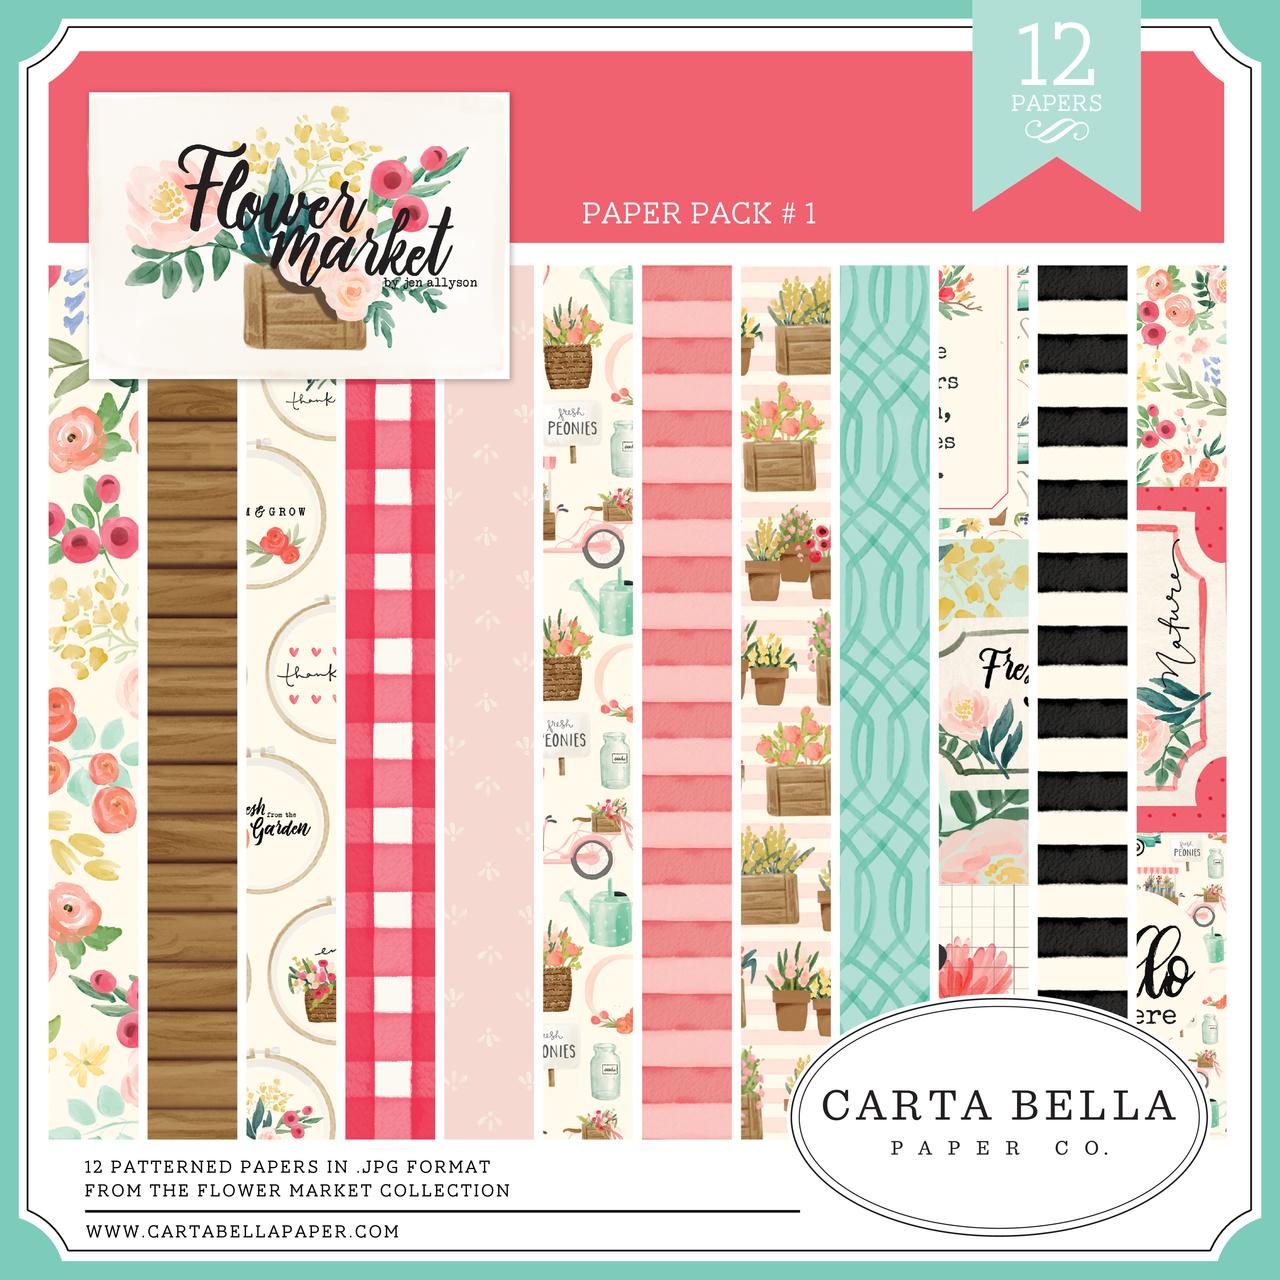 Flower Market Paper Pack #1